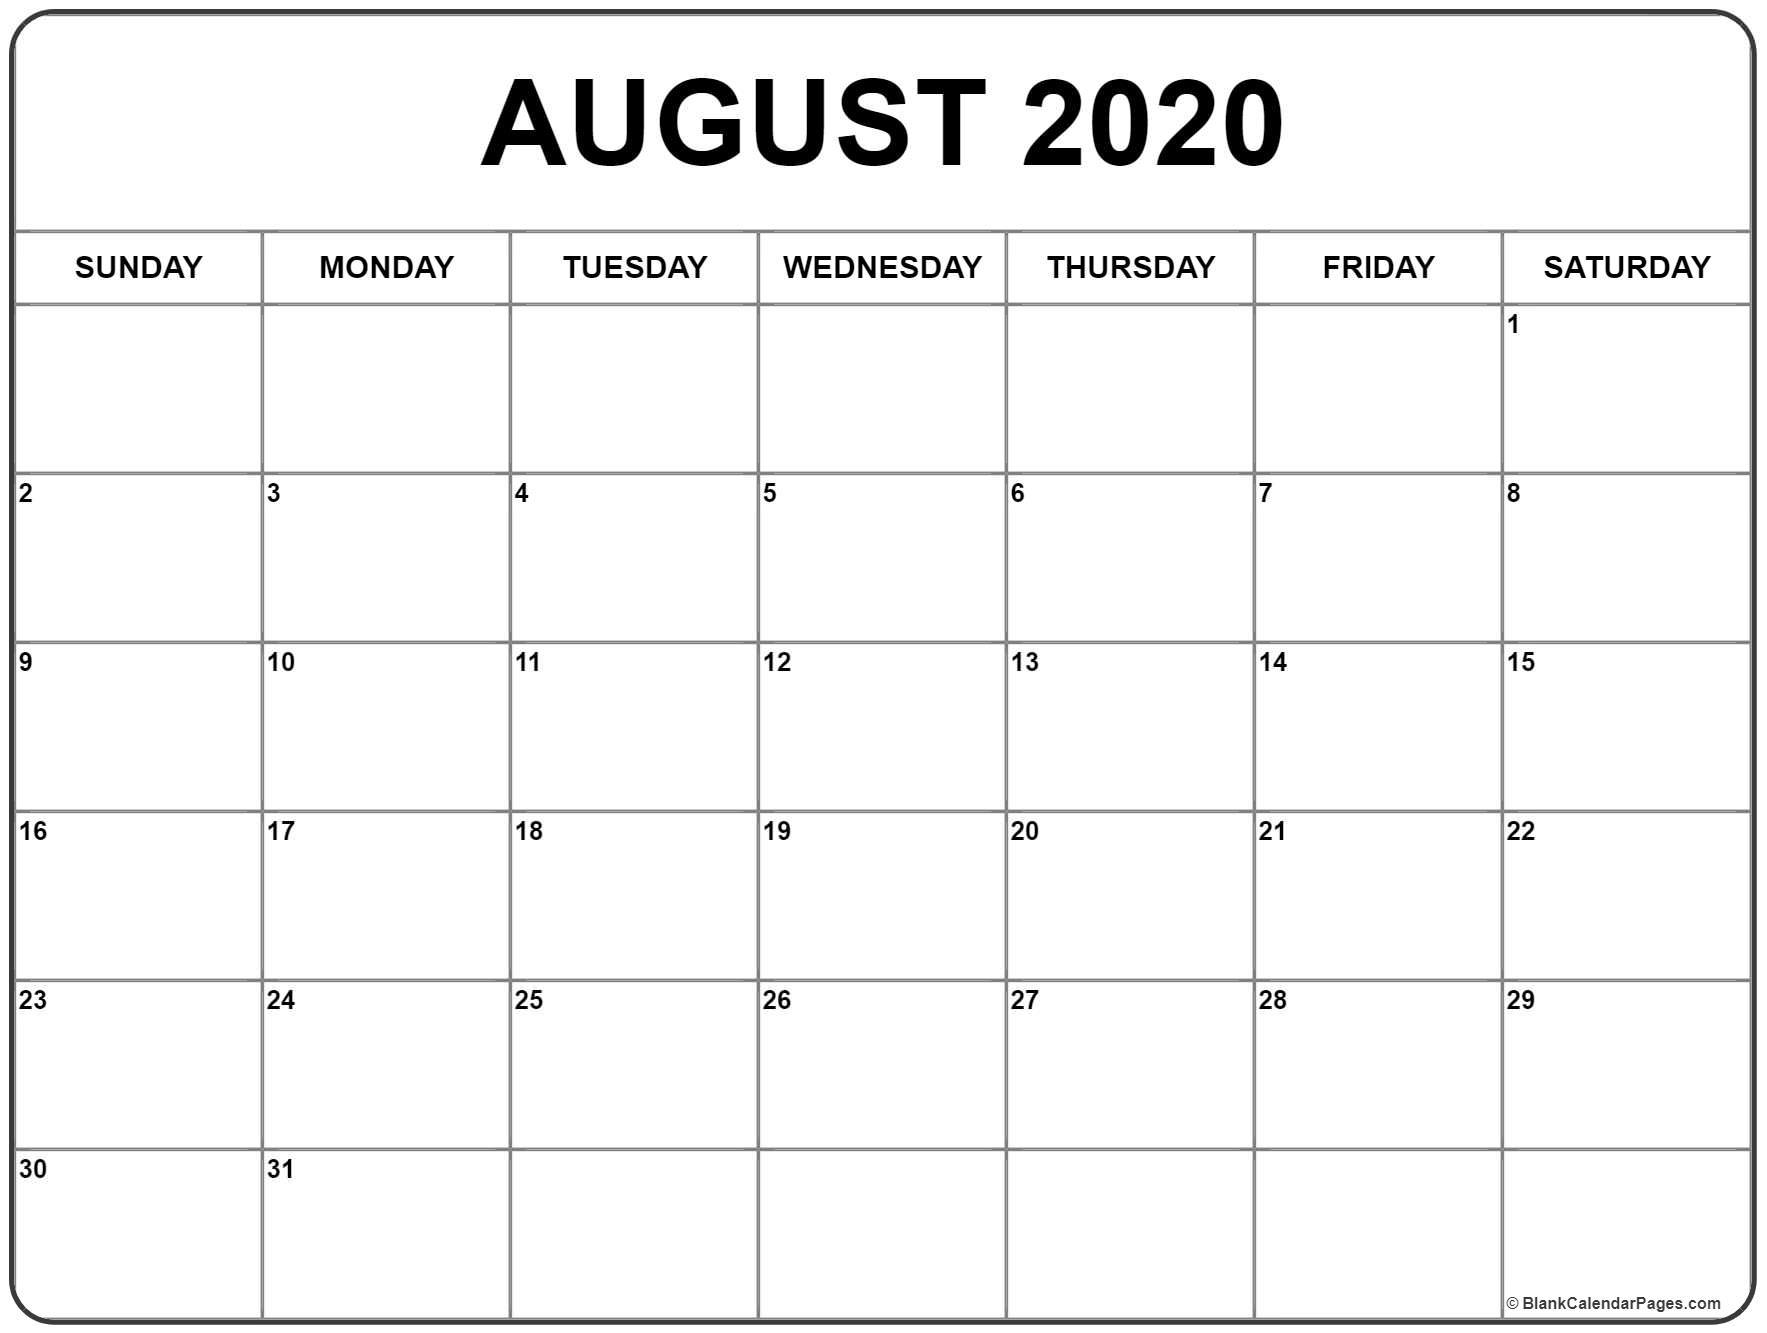 August 2020 Calendar | Free Printable Monthly Calendars inside 2020 Fill In Calendar